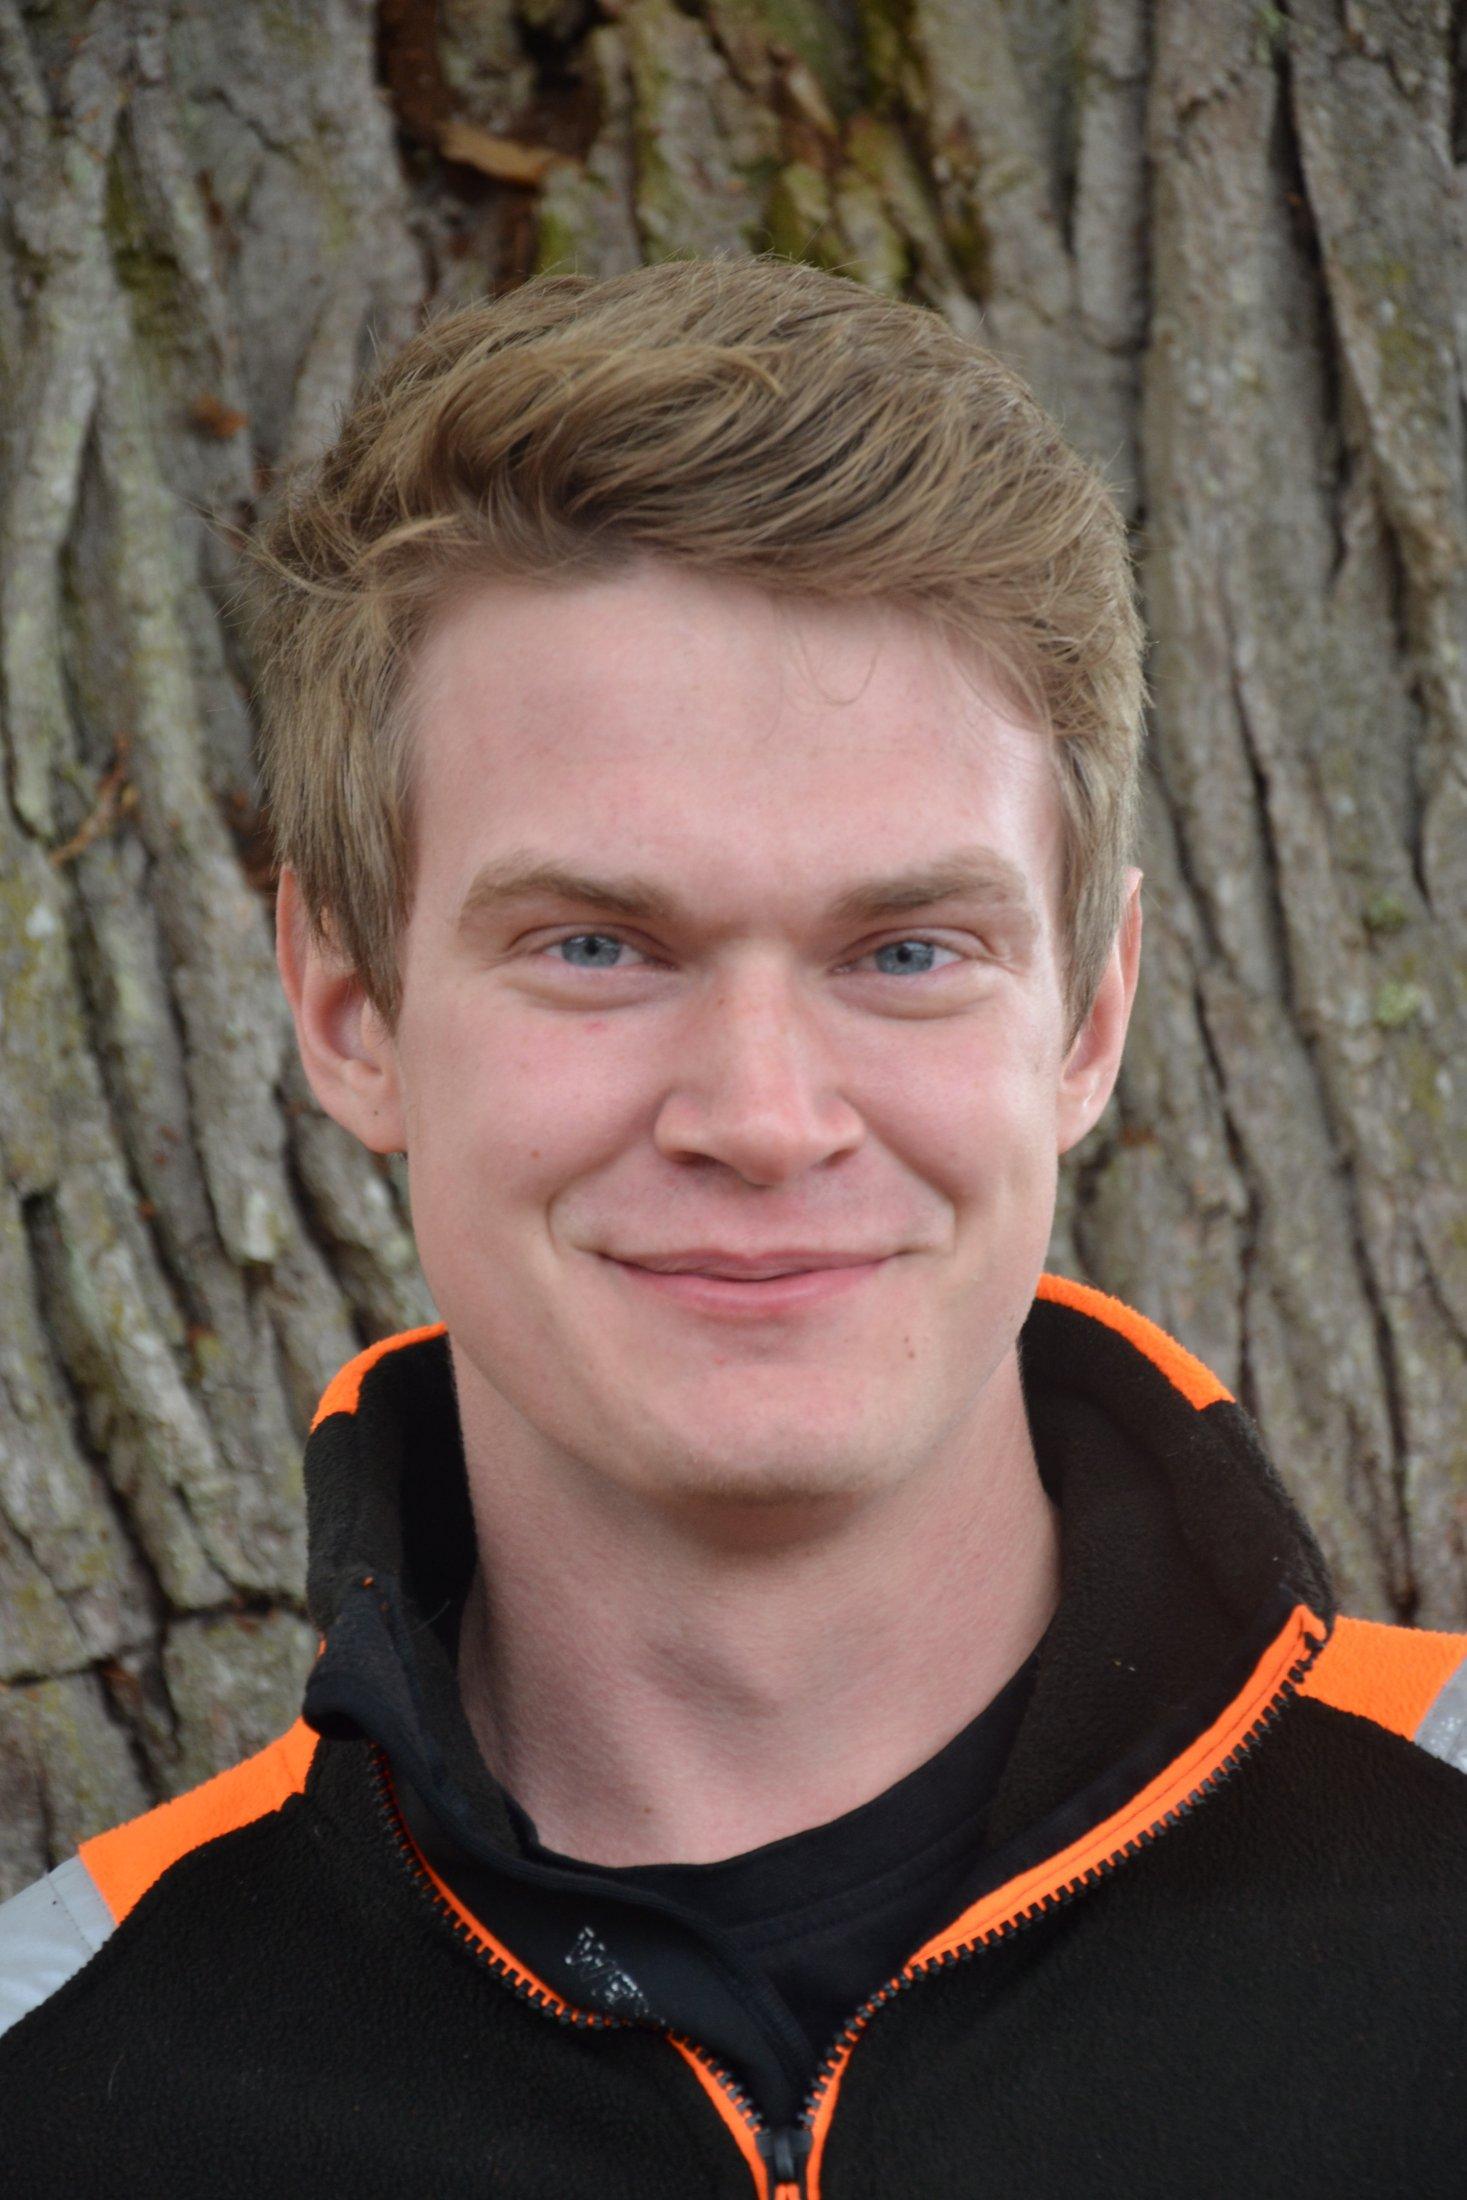 Mark Olofsson